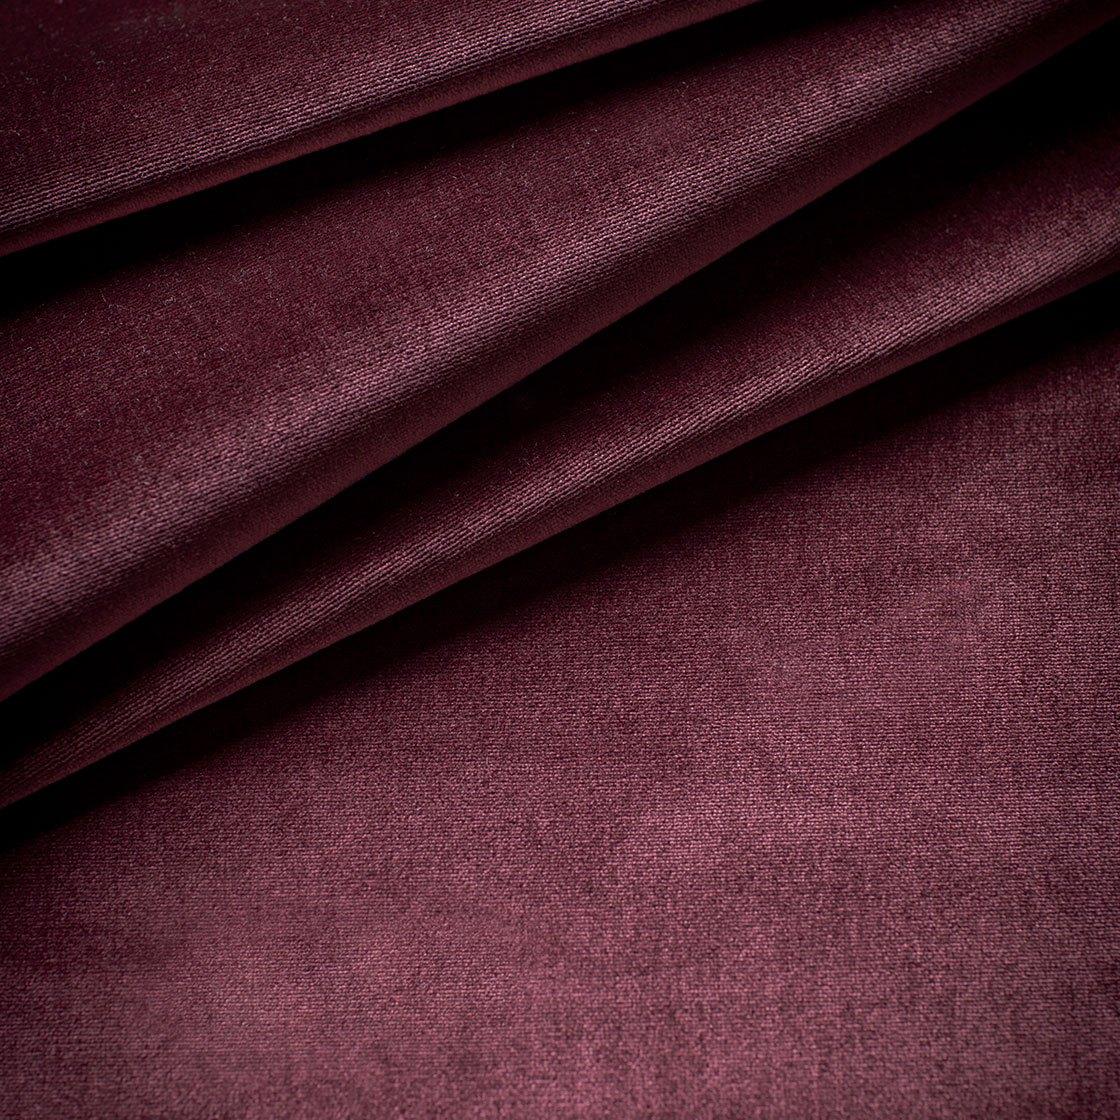 Capri Silk Velvet - Loganberry - Beaumont & Fletcher - Beaumont & Fletcher